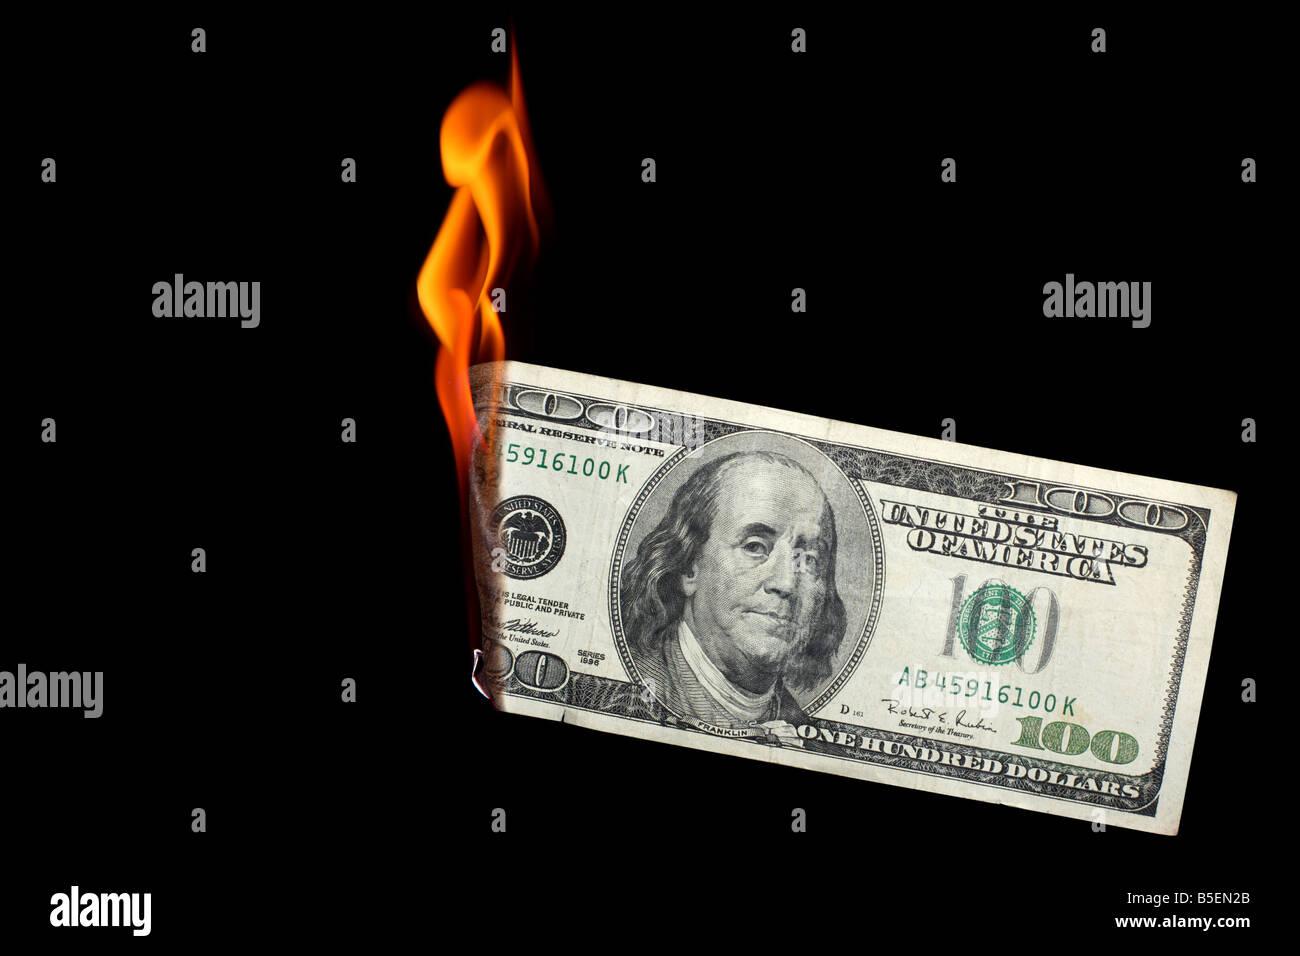 One hundred dollar bill burning on black background Stock Photo